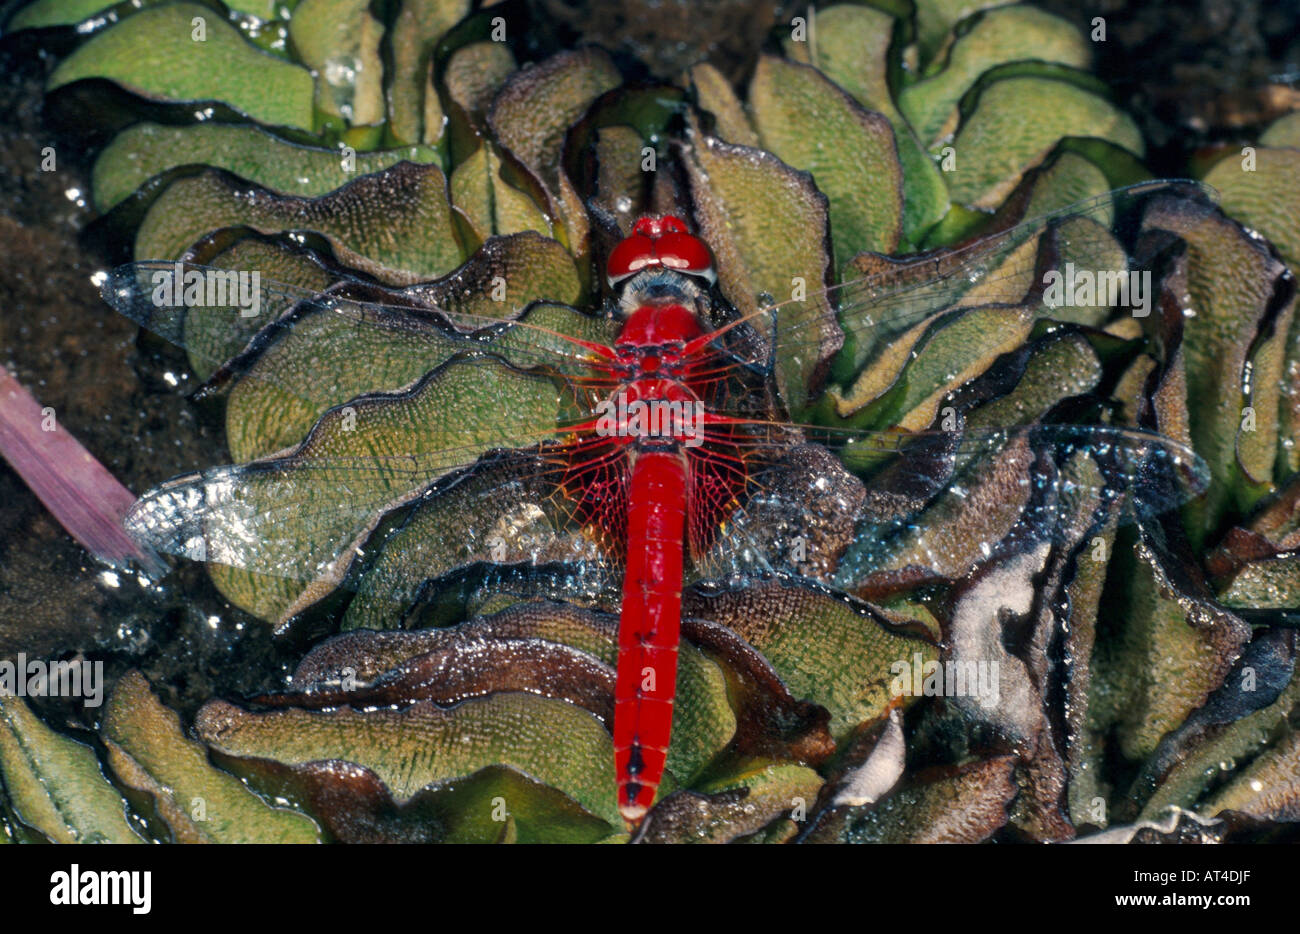 scarlet darter (Crocothemis erythraea), male on water fern, Salvinia Stock Photo